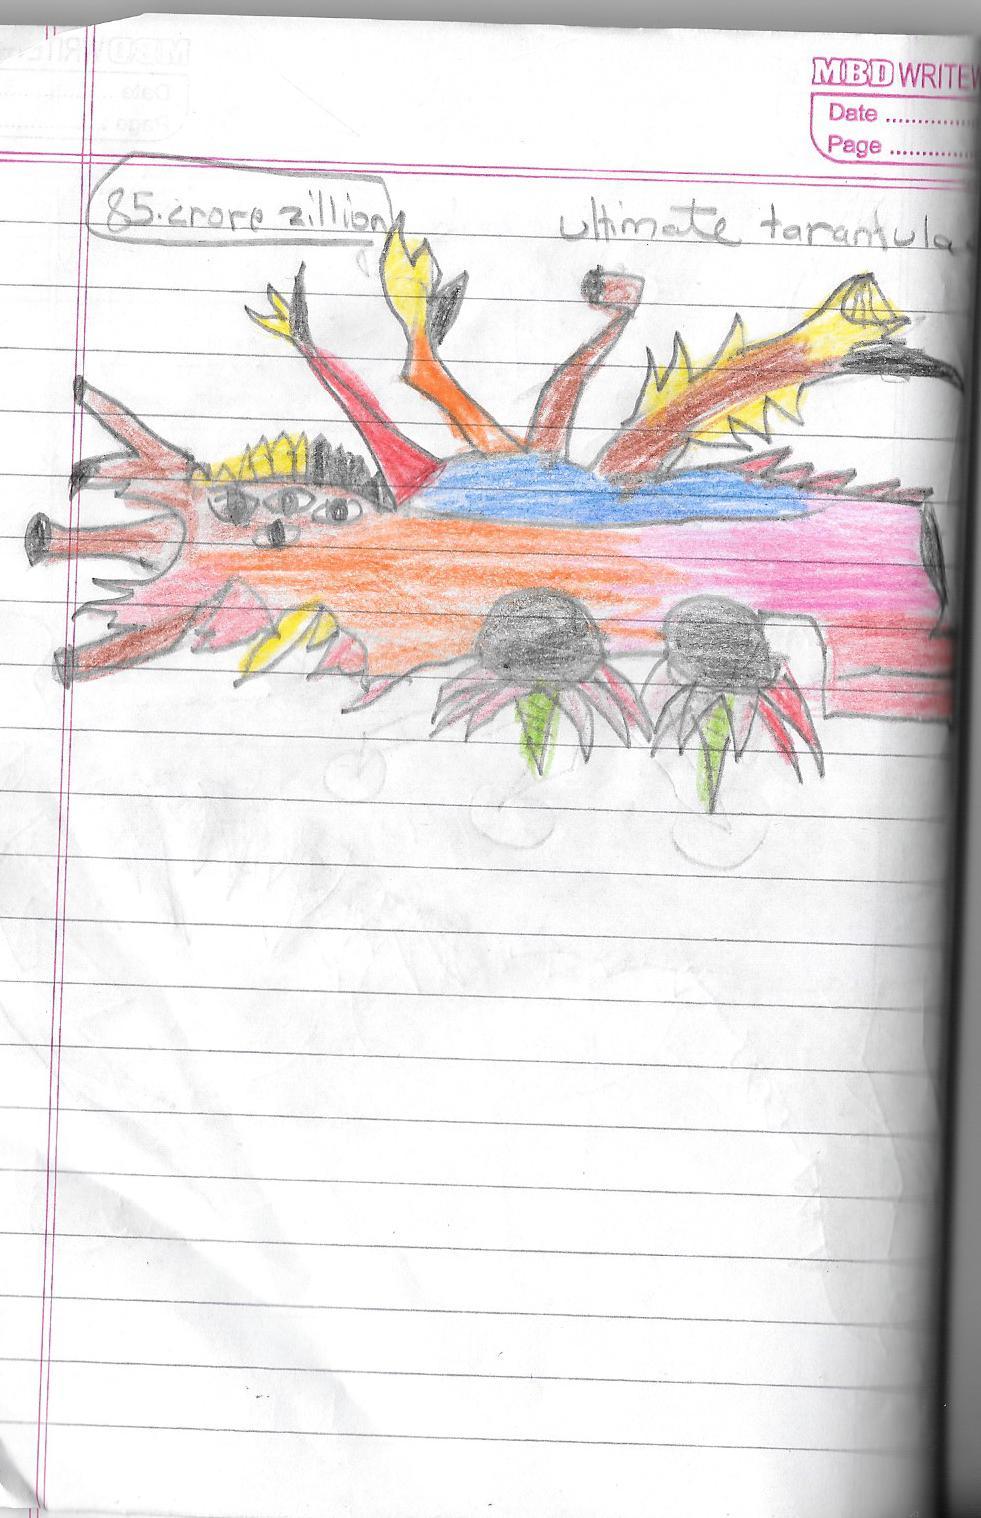 Drawn spider dragon Dragon drawn spider spider car